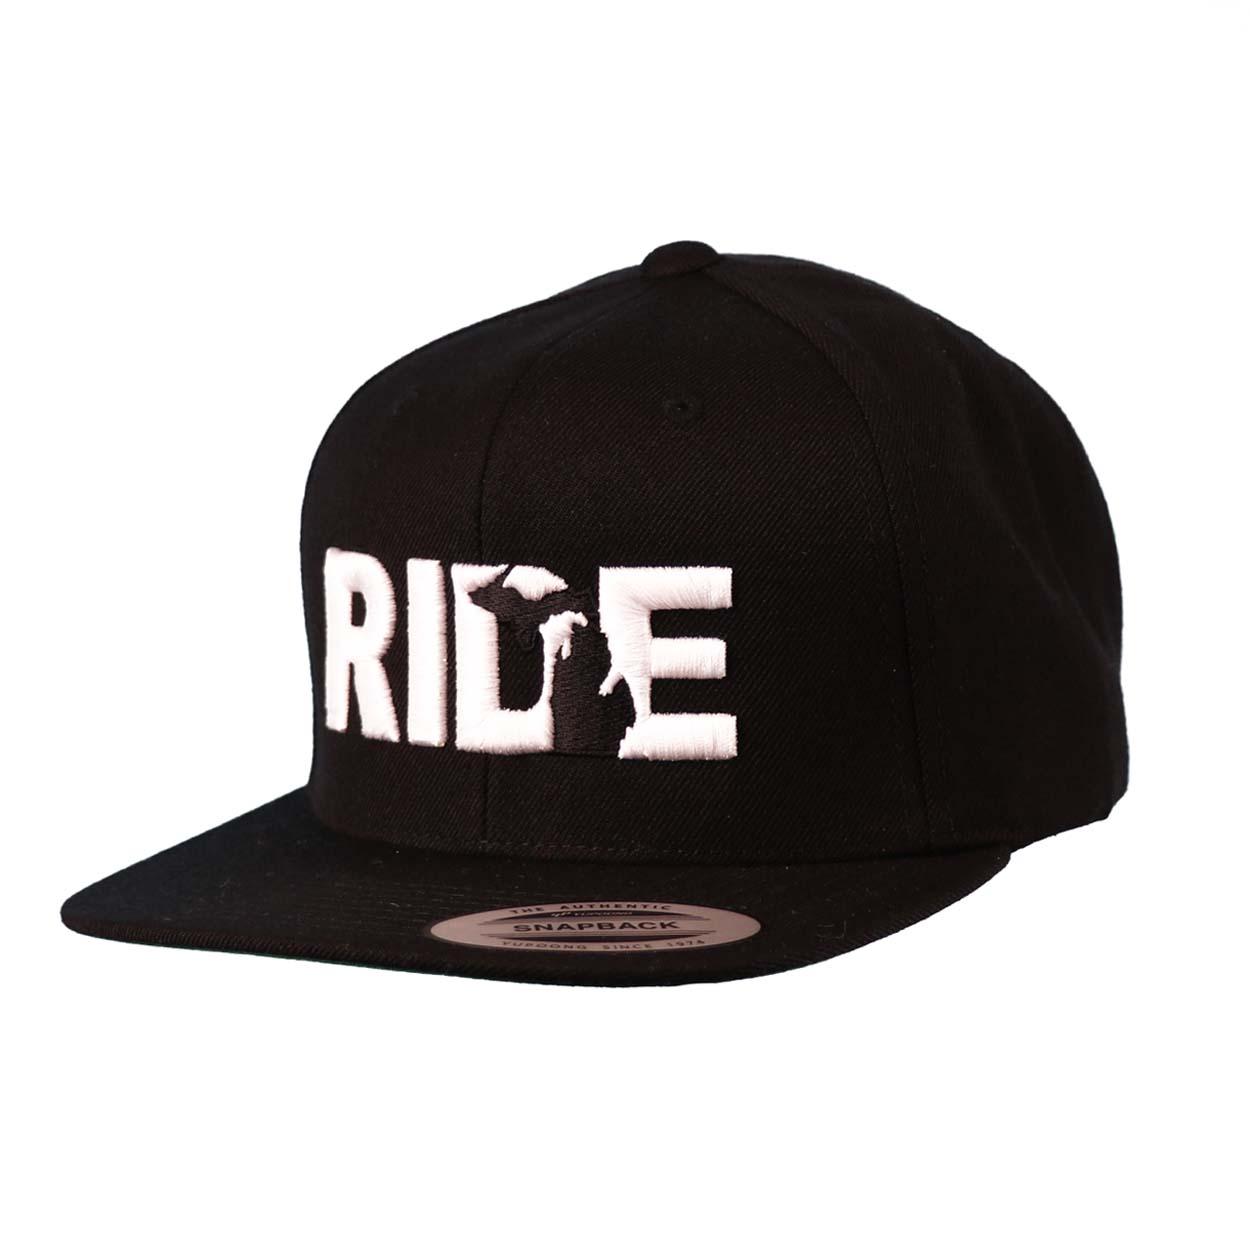 Ride Michigan Classic Embroidered  Snapback Flat Brim Hat Black/White